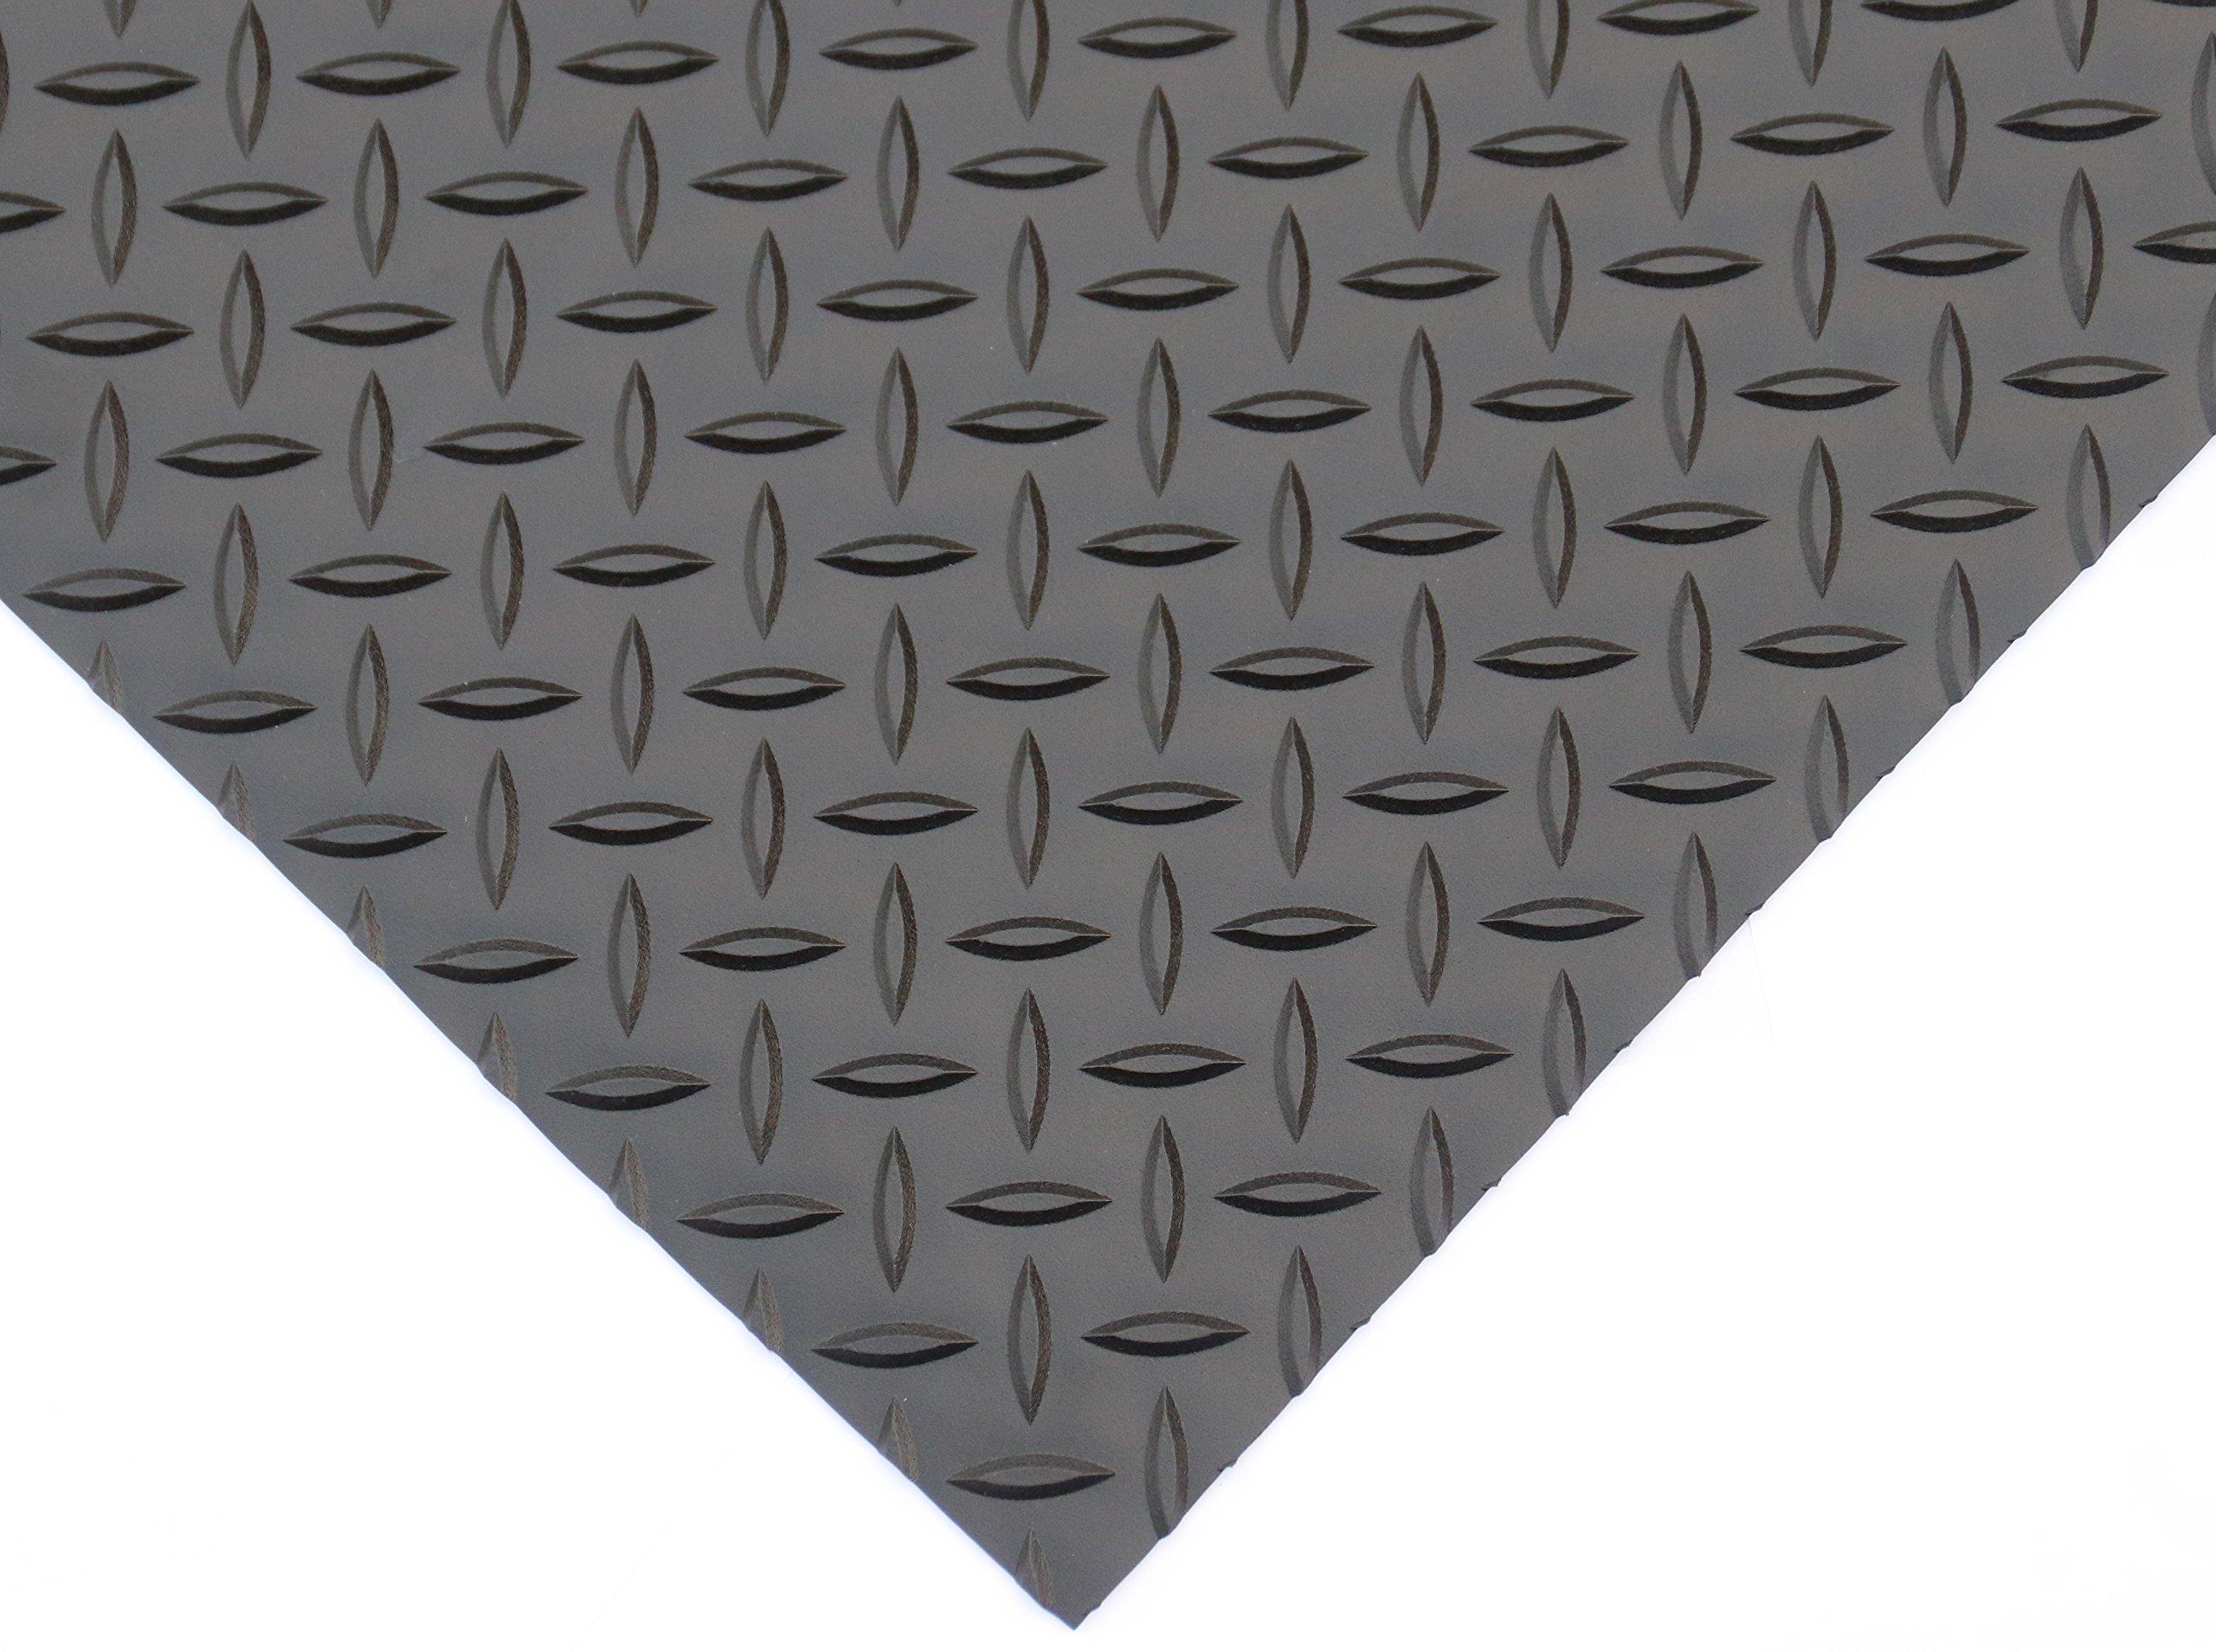 Rhino Mats DV48X2 Diamond Plate Rubber Flooring, Rubber, 1/8'' Thickness, Matt black